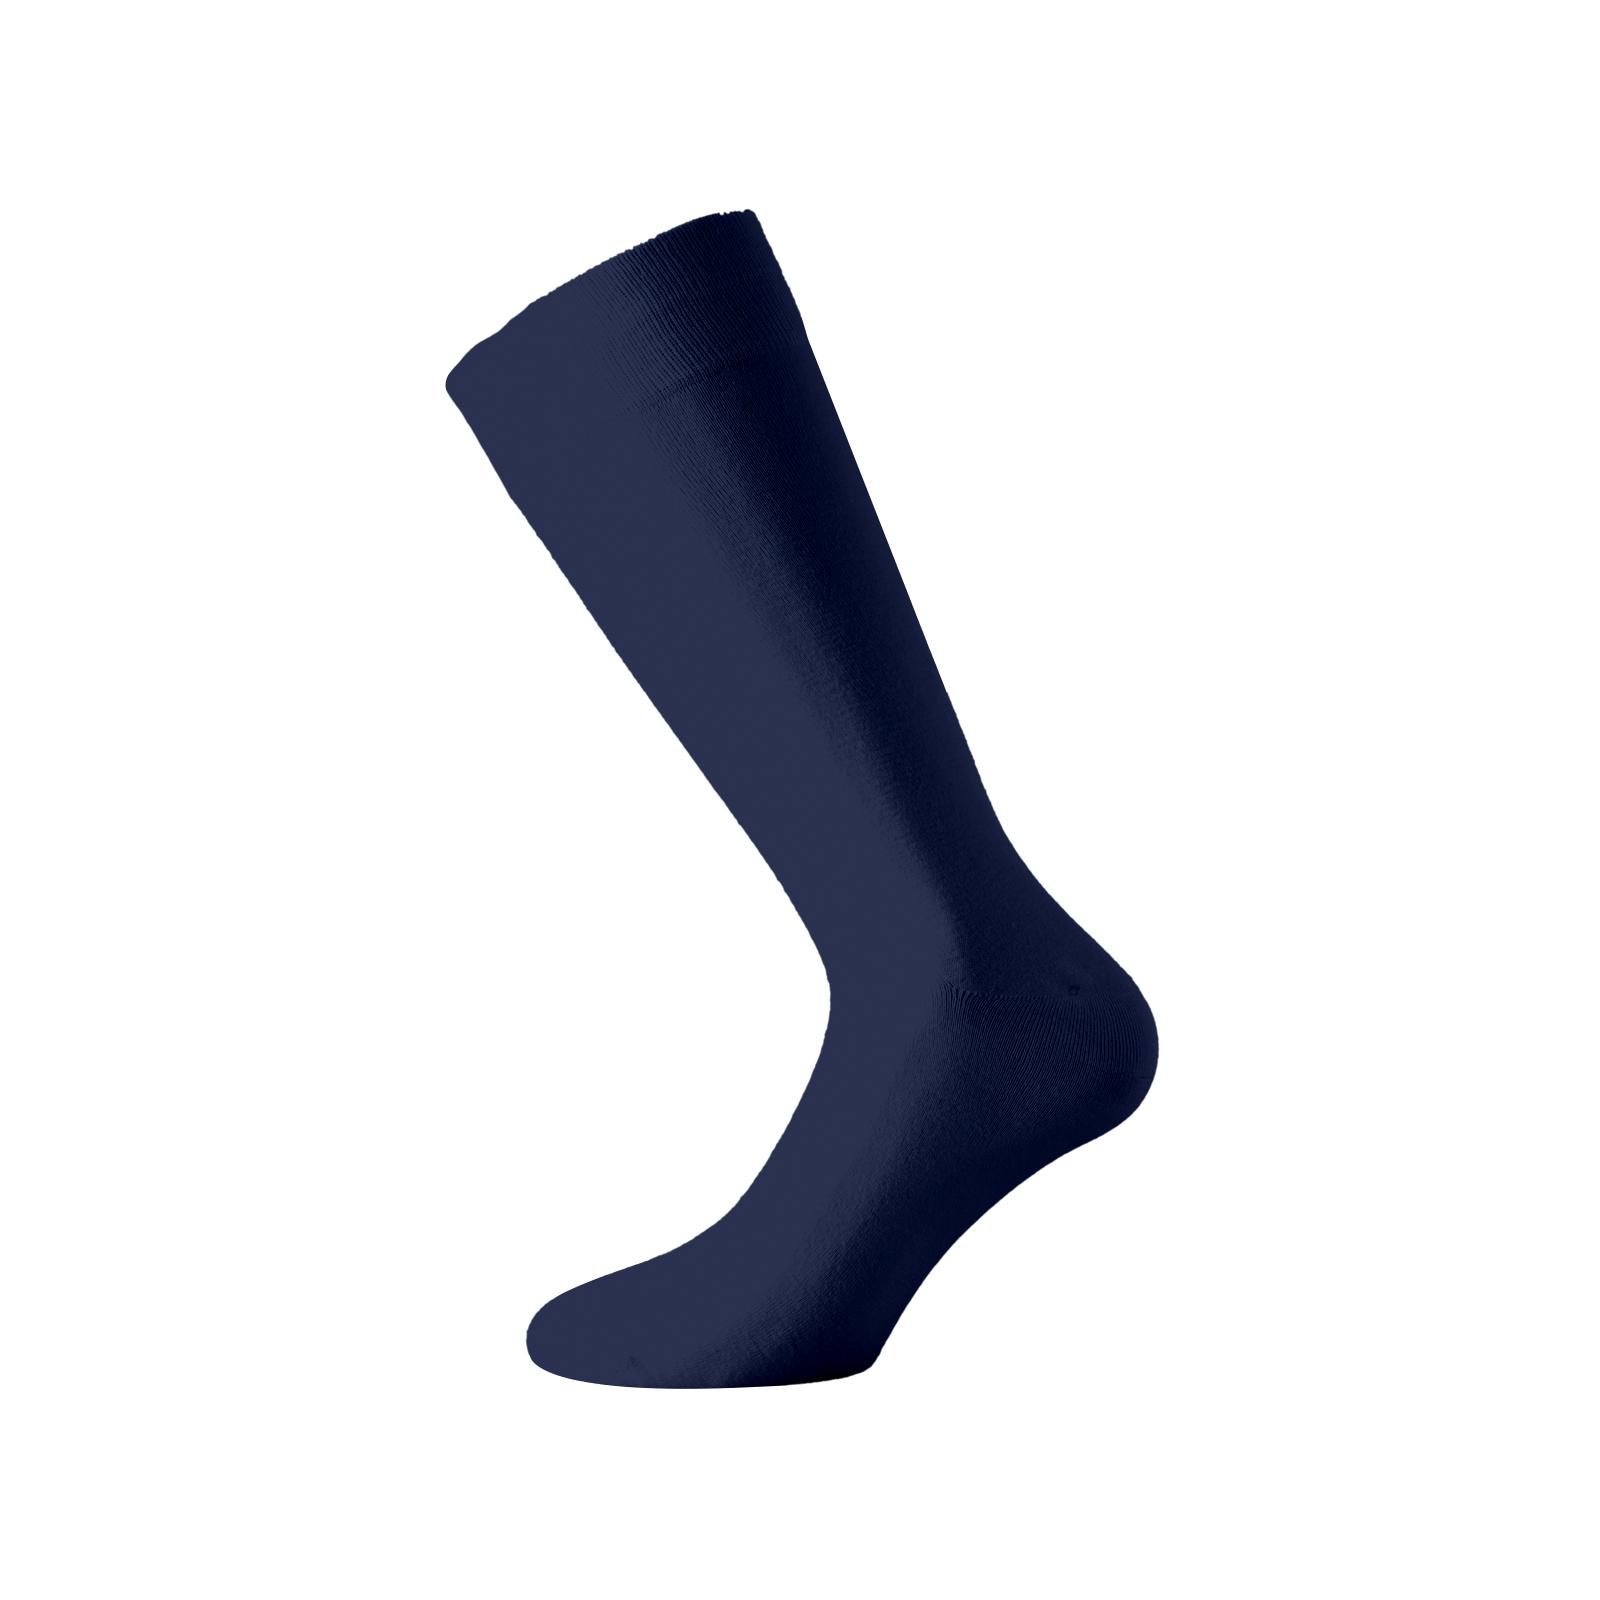 Walk Ανδρική κάλτσα - Bamboo - Aντιβακτηριδιακή δράση - Μπλε σκούρο